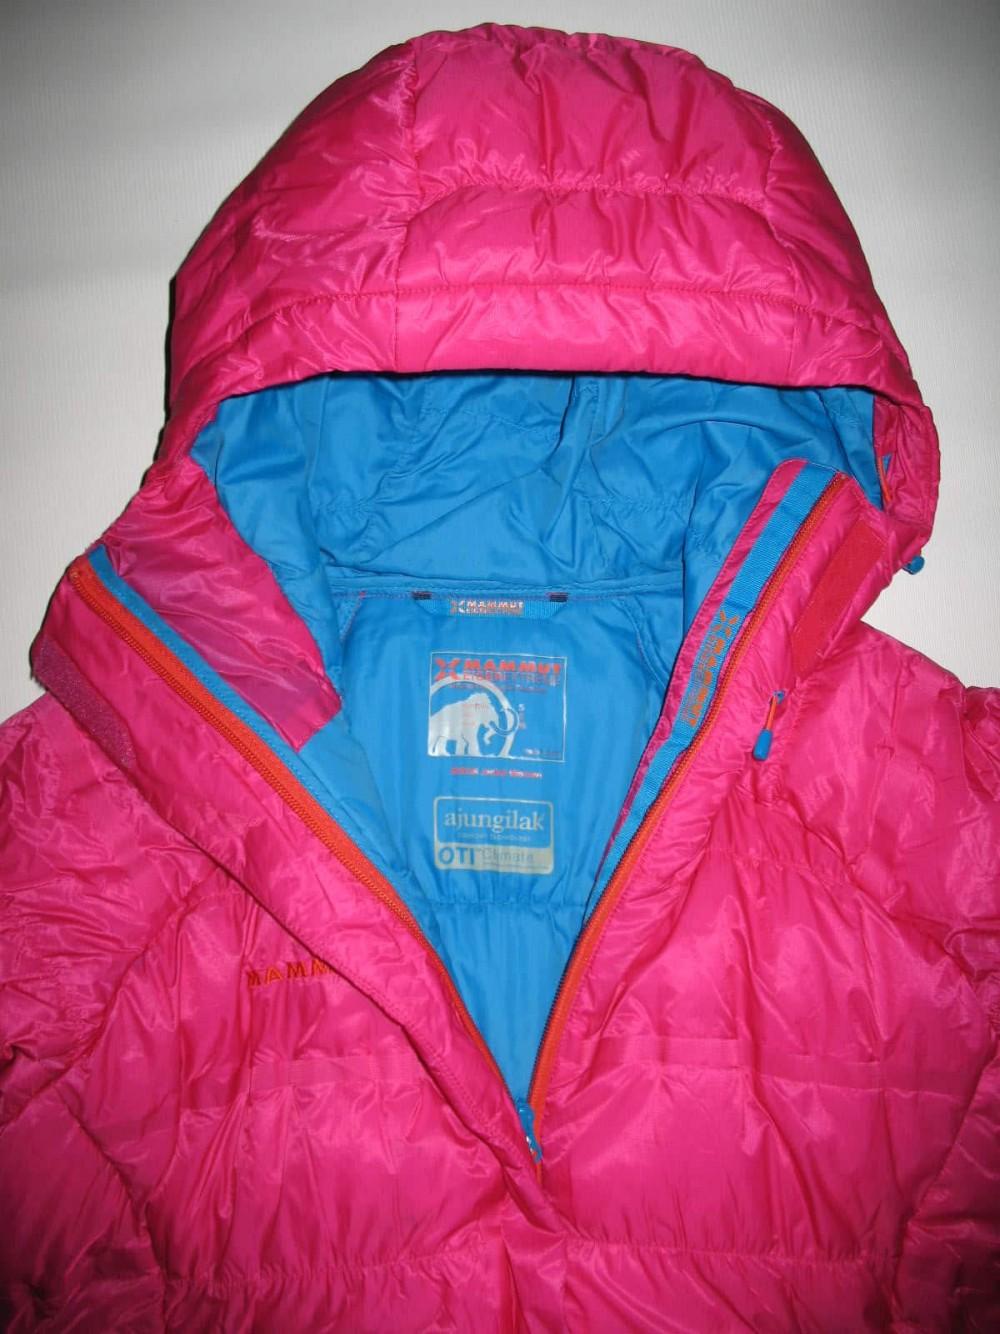 Куртка MAMMUT biwak eiger extreme jacket lady (размер S/M),3200 грн - 5